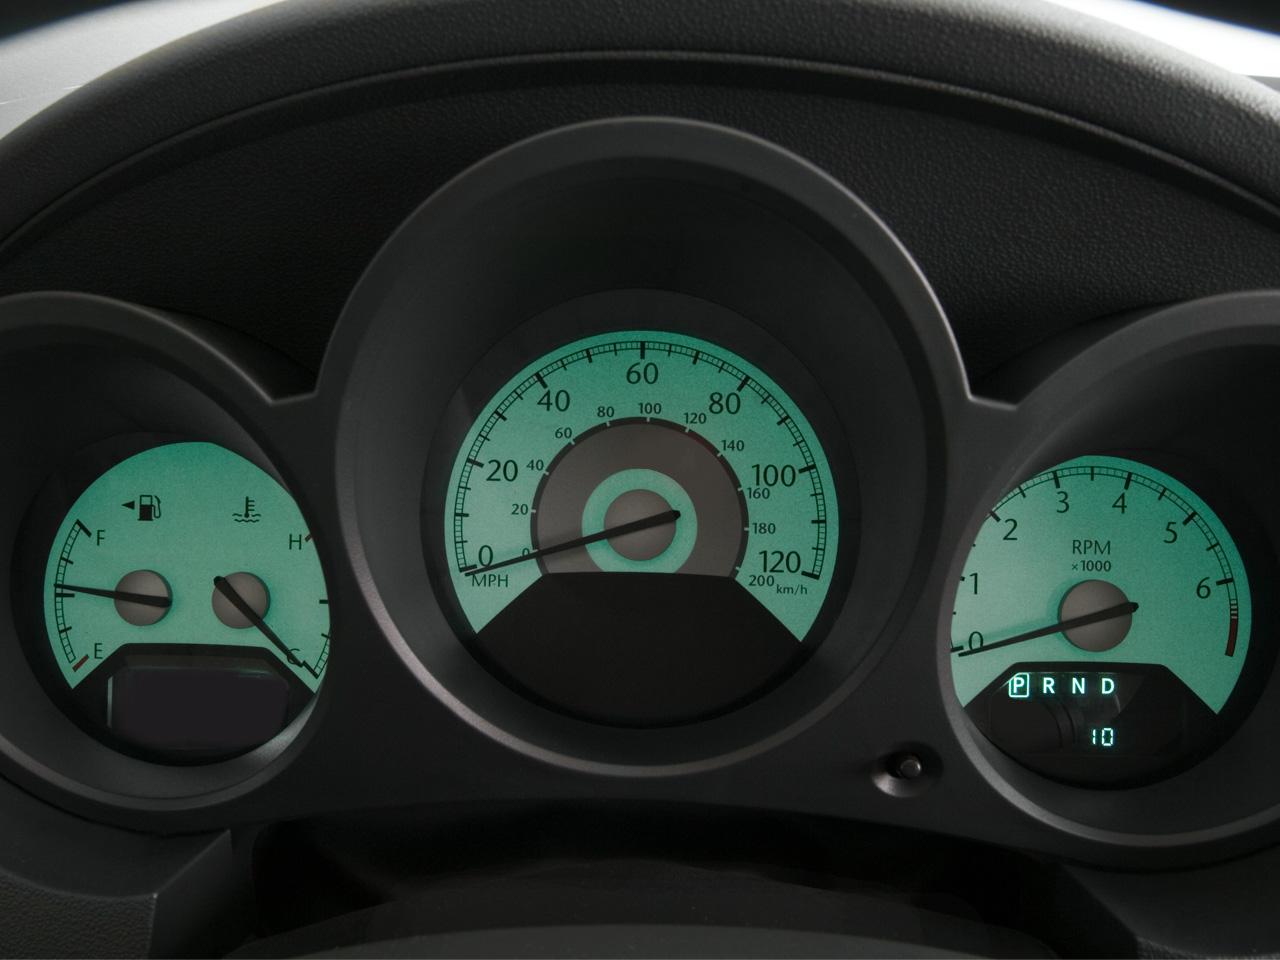 2007 Chrysler Sebring New And Future Cars Trucks Suvs Mopar Wiring Diagrams Instrument Panel 18